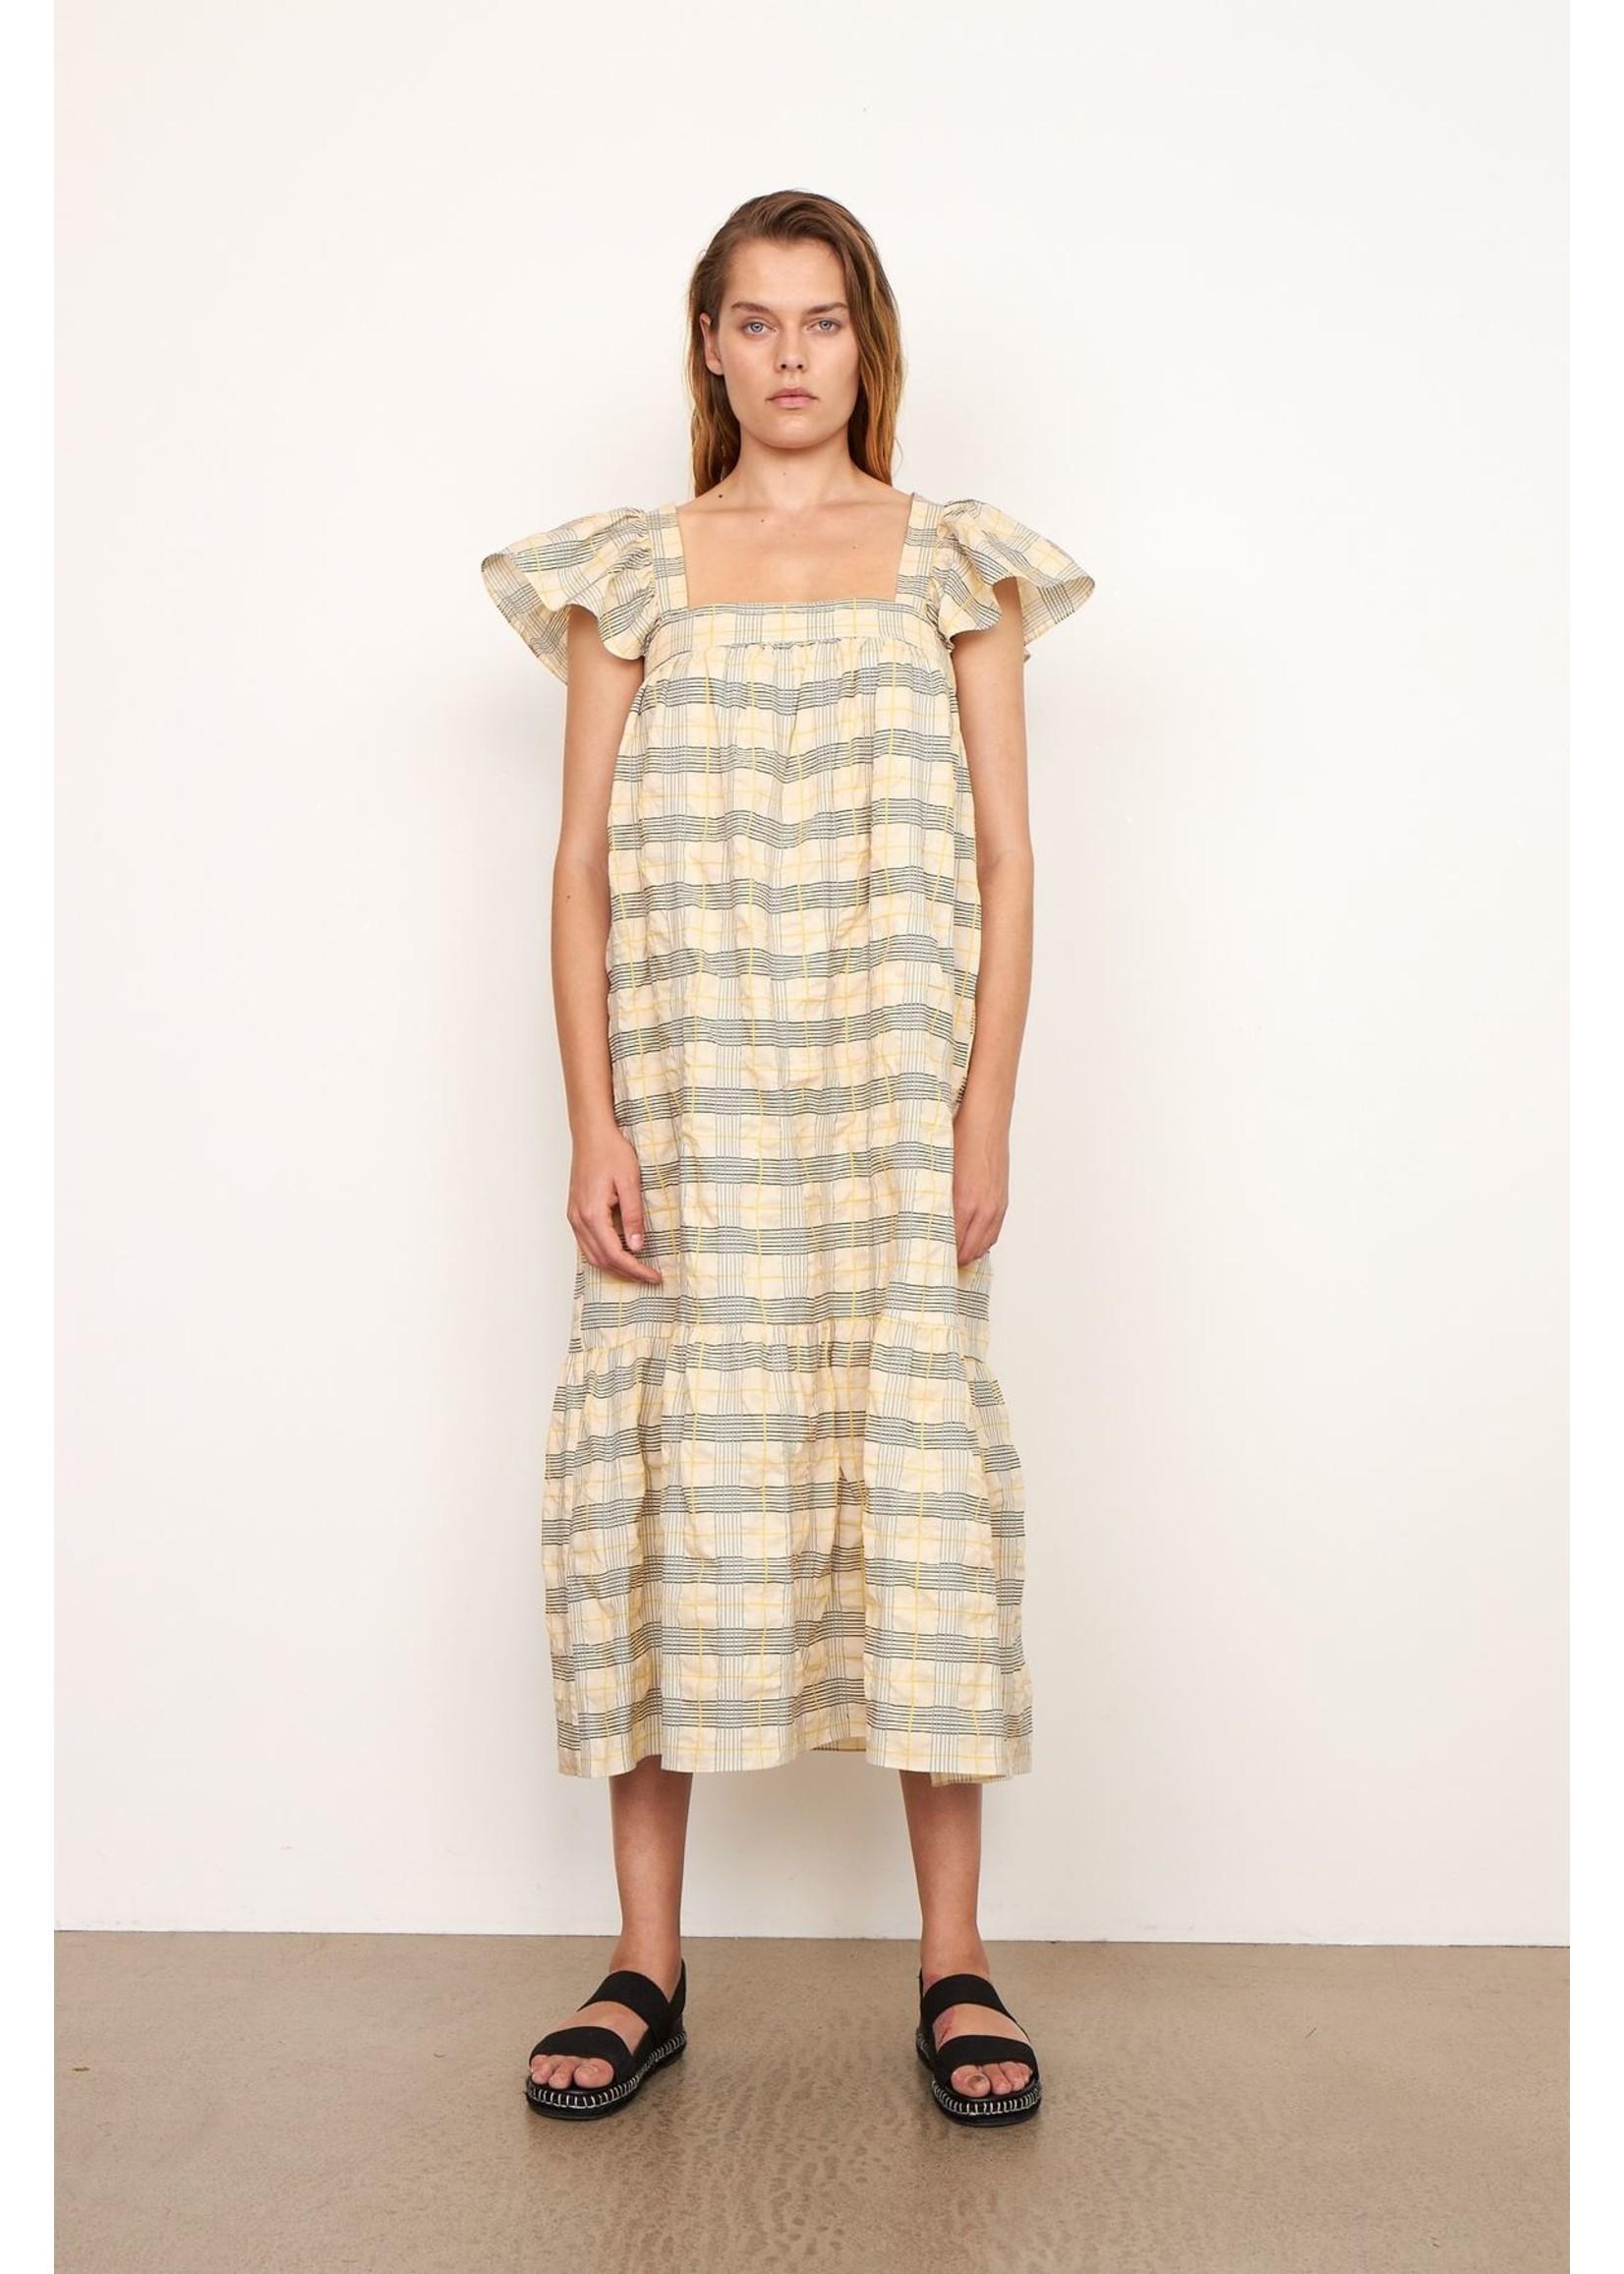 CROSS BACK STRAP DRESS